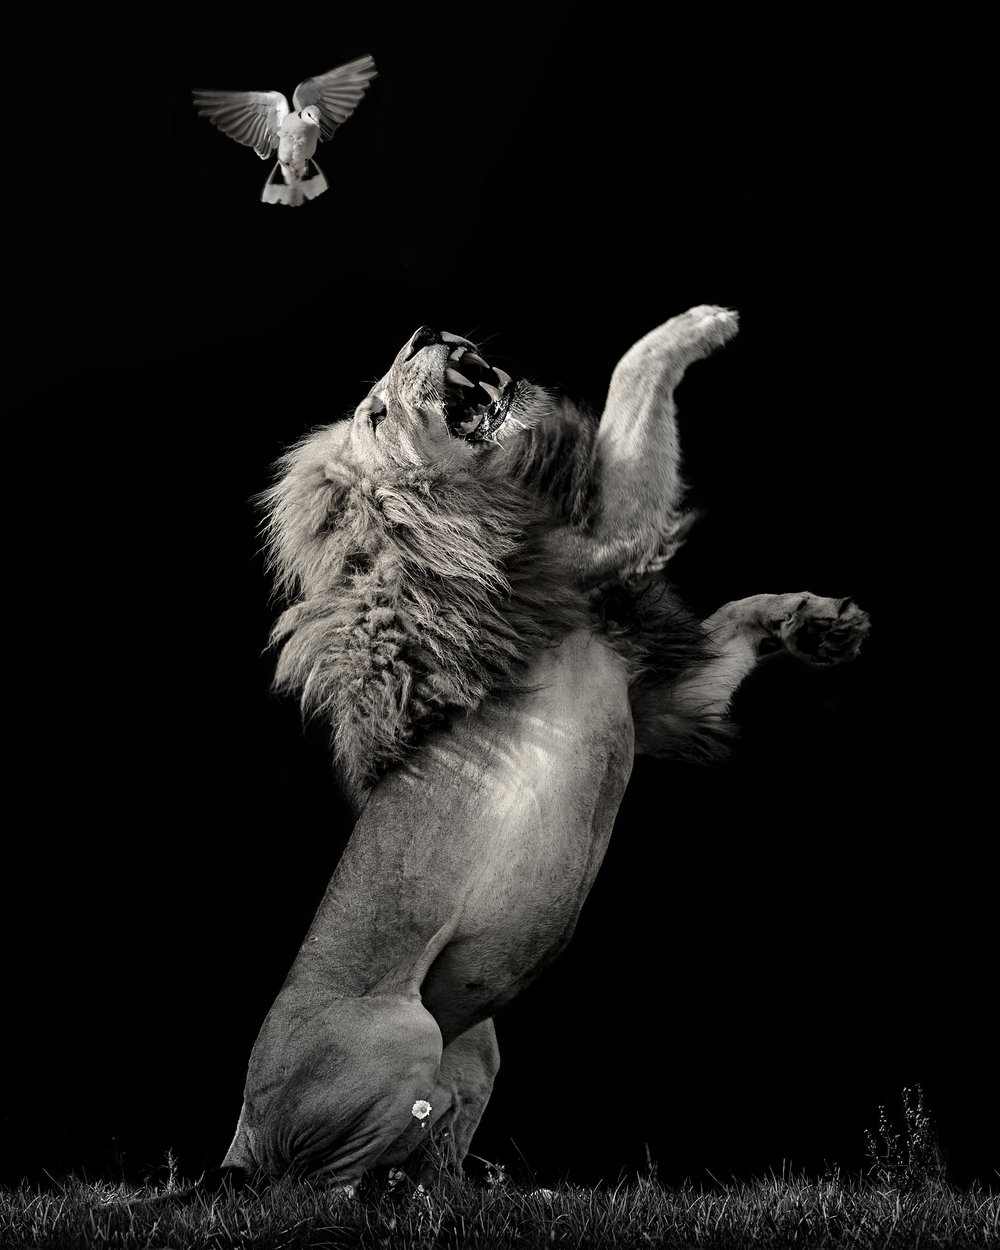 Simon+Needham+Humanitarian+Photography+Lions+of+Africa+13.jpg